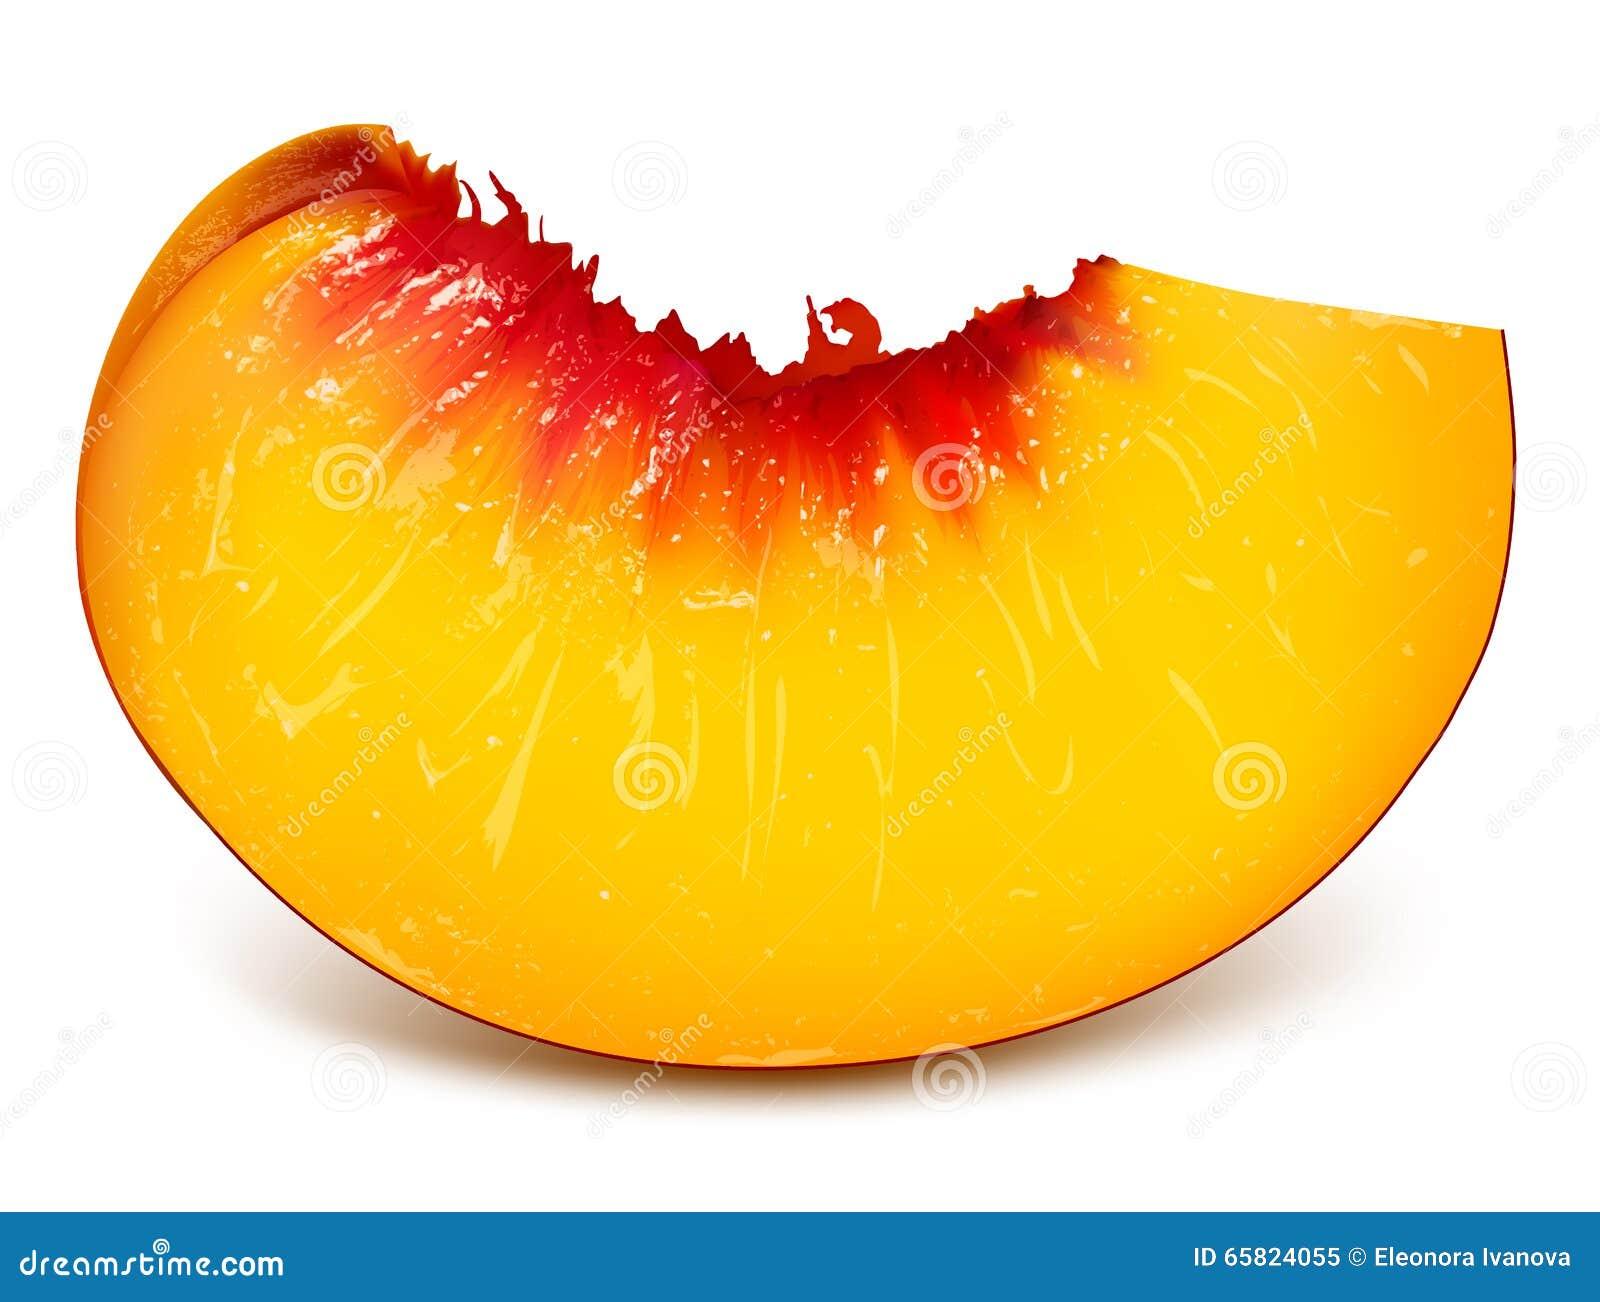 Slice of ripe peach